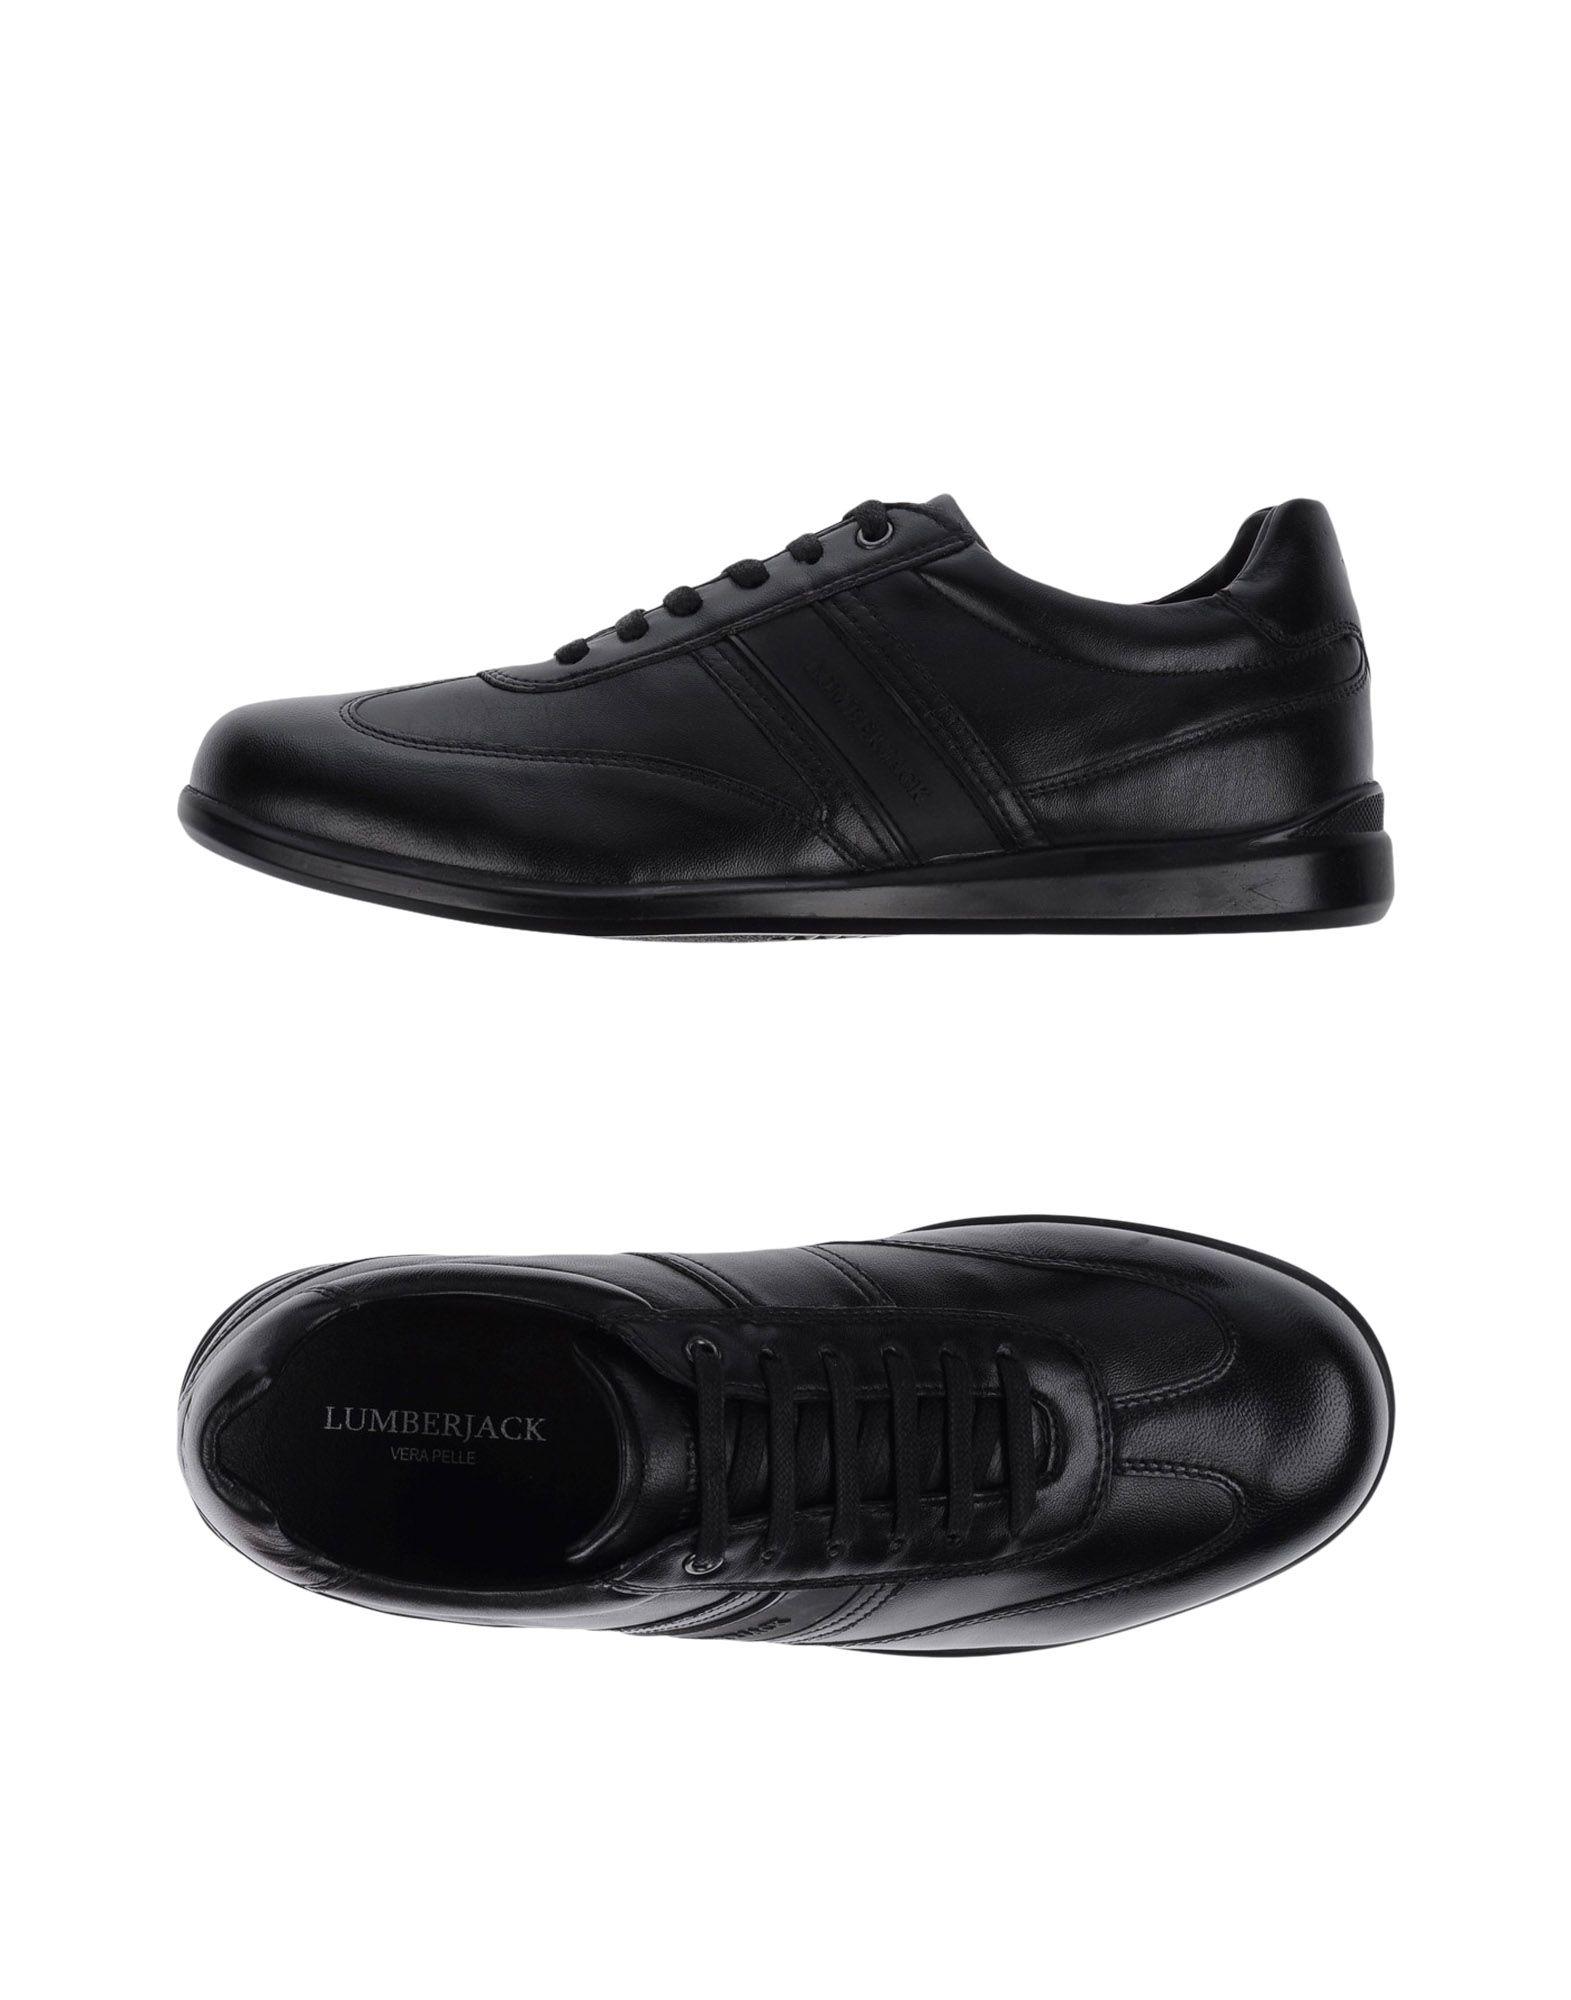 LUMBERJACK Herren Low Sneakers & Tennisschuhe Farbe Schwarz Größe 5 jetztbilligerkaufen